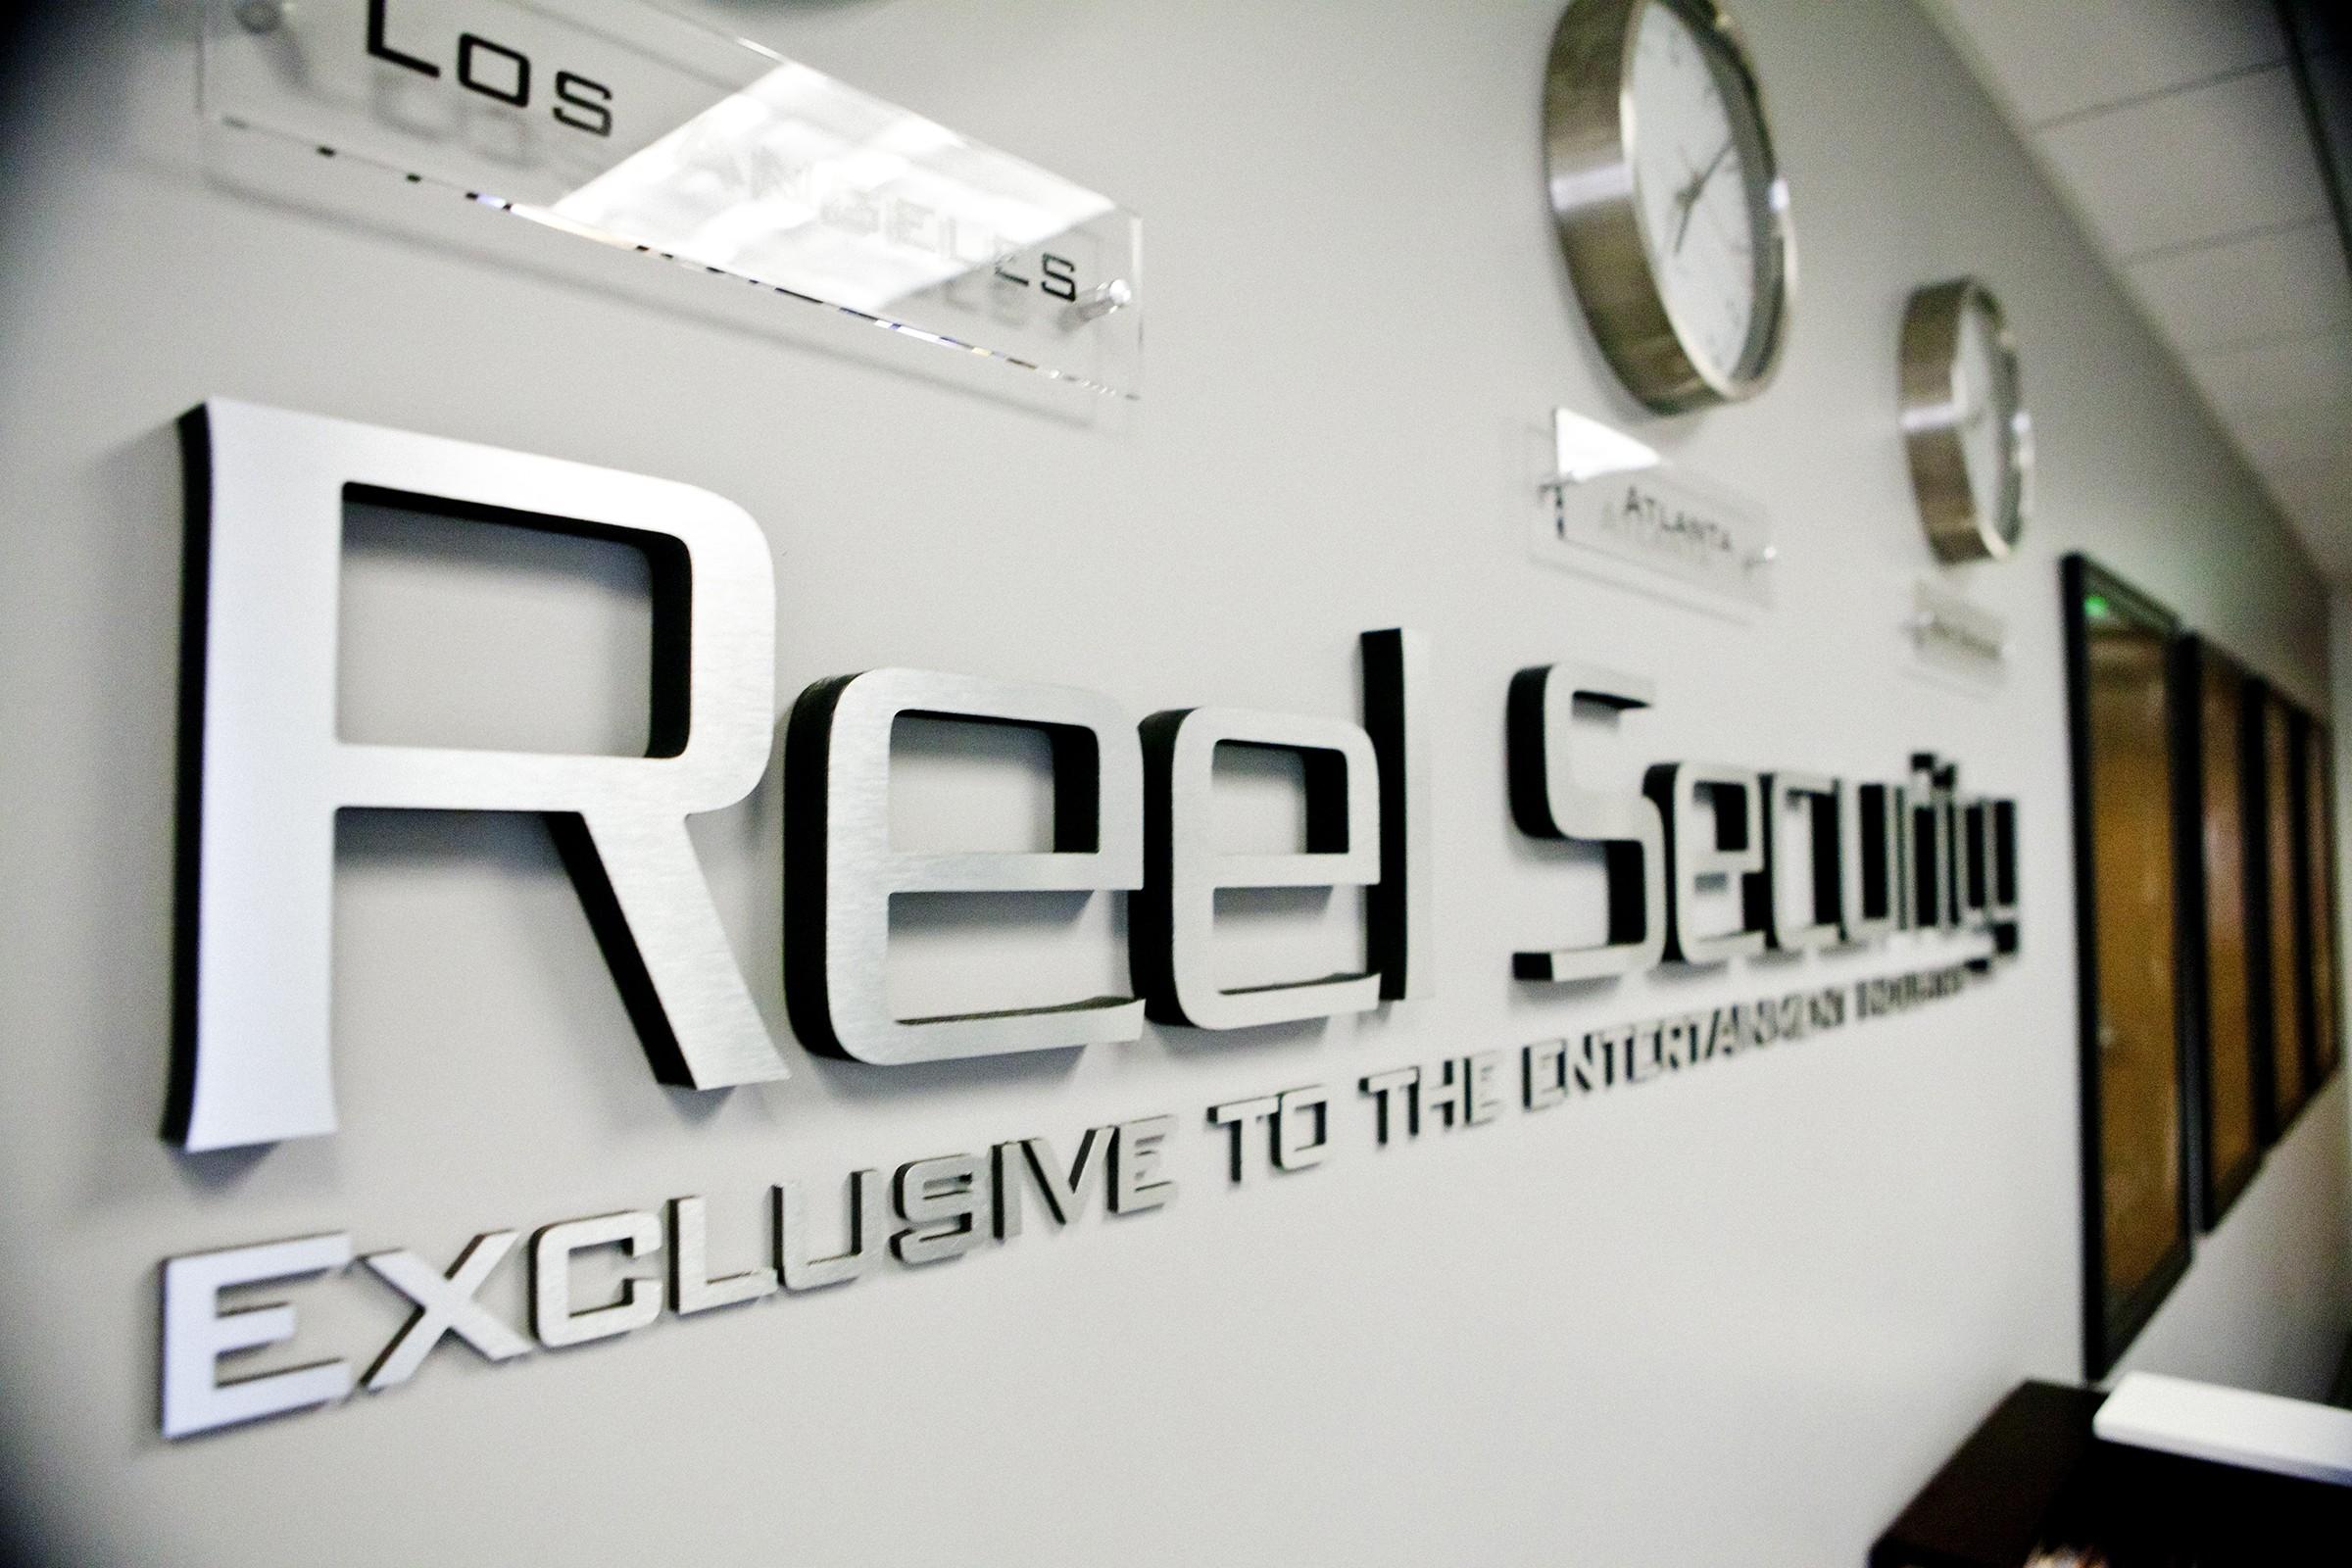 Reel Security Corp  | LinkedIn